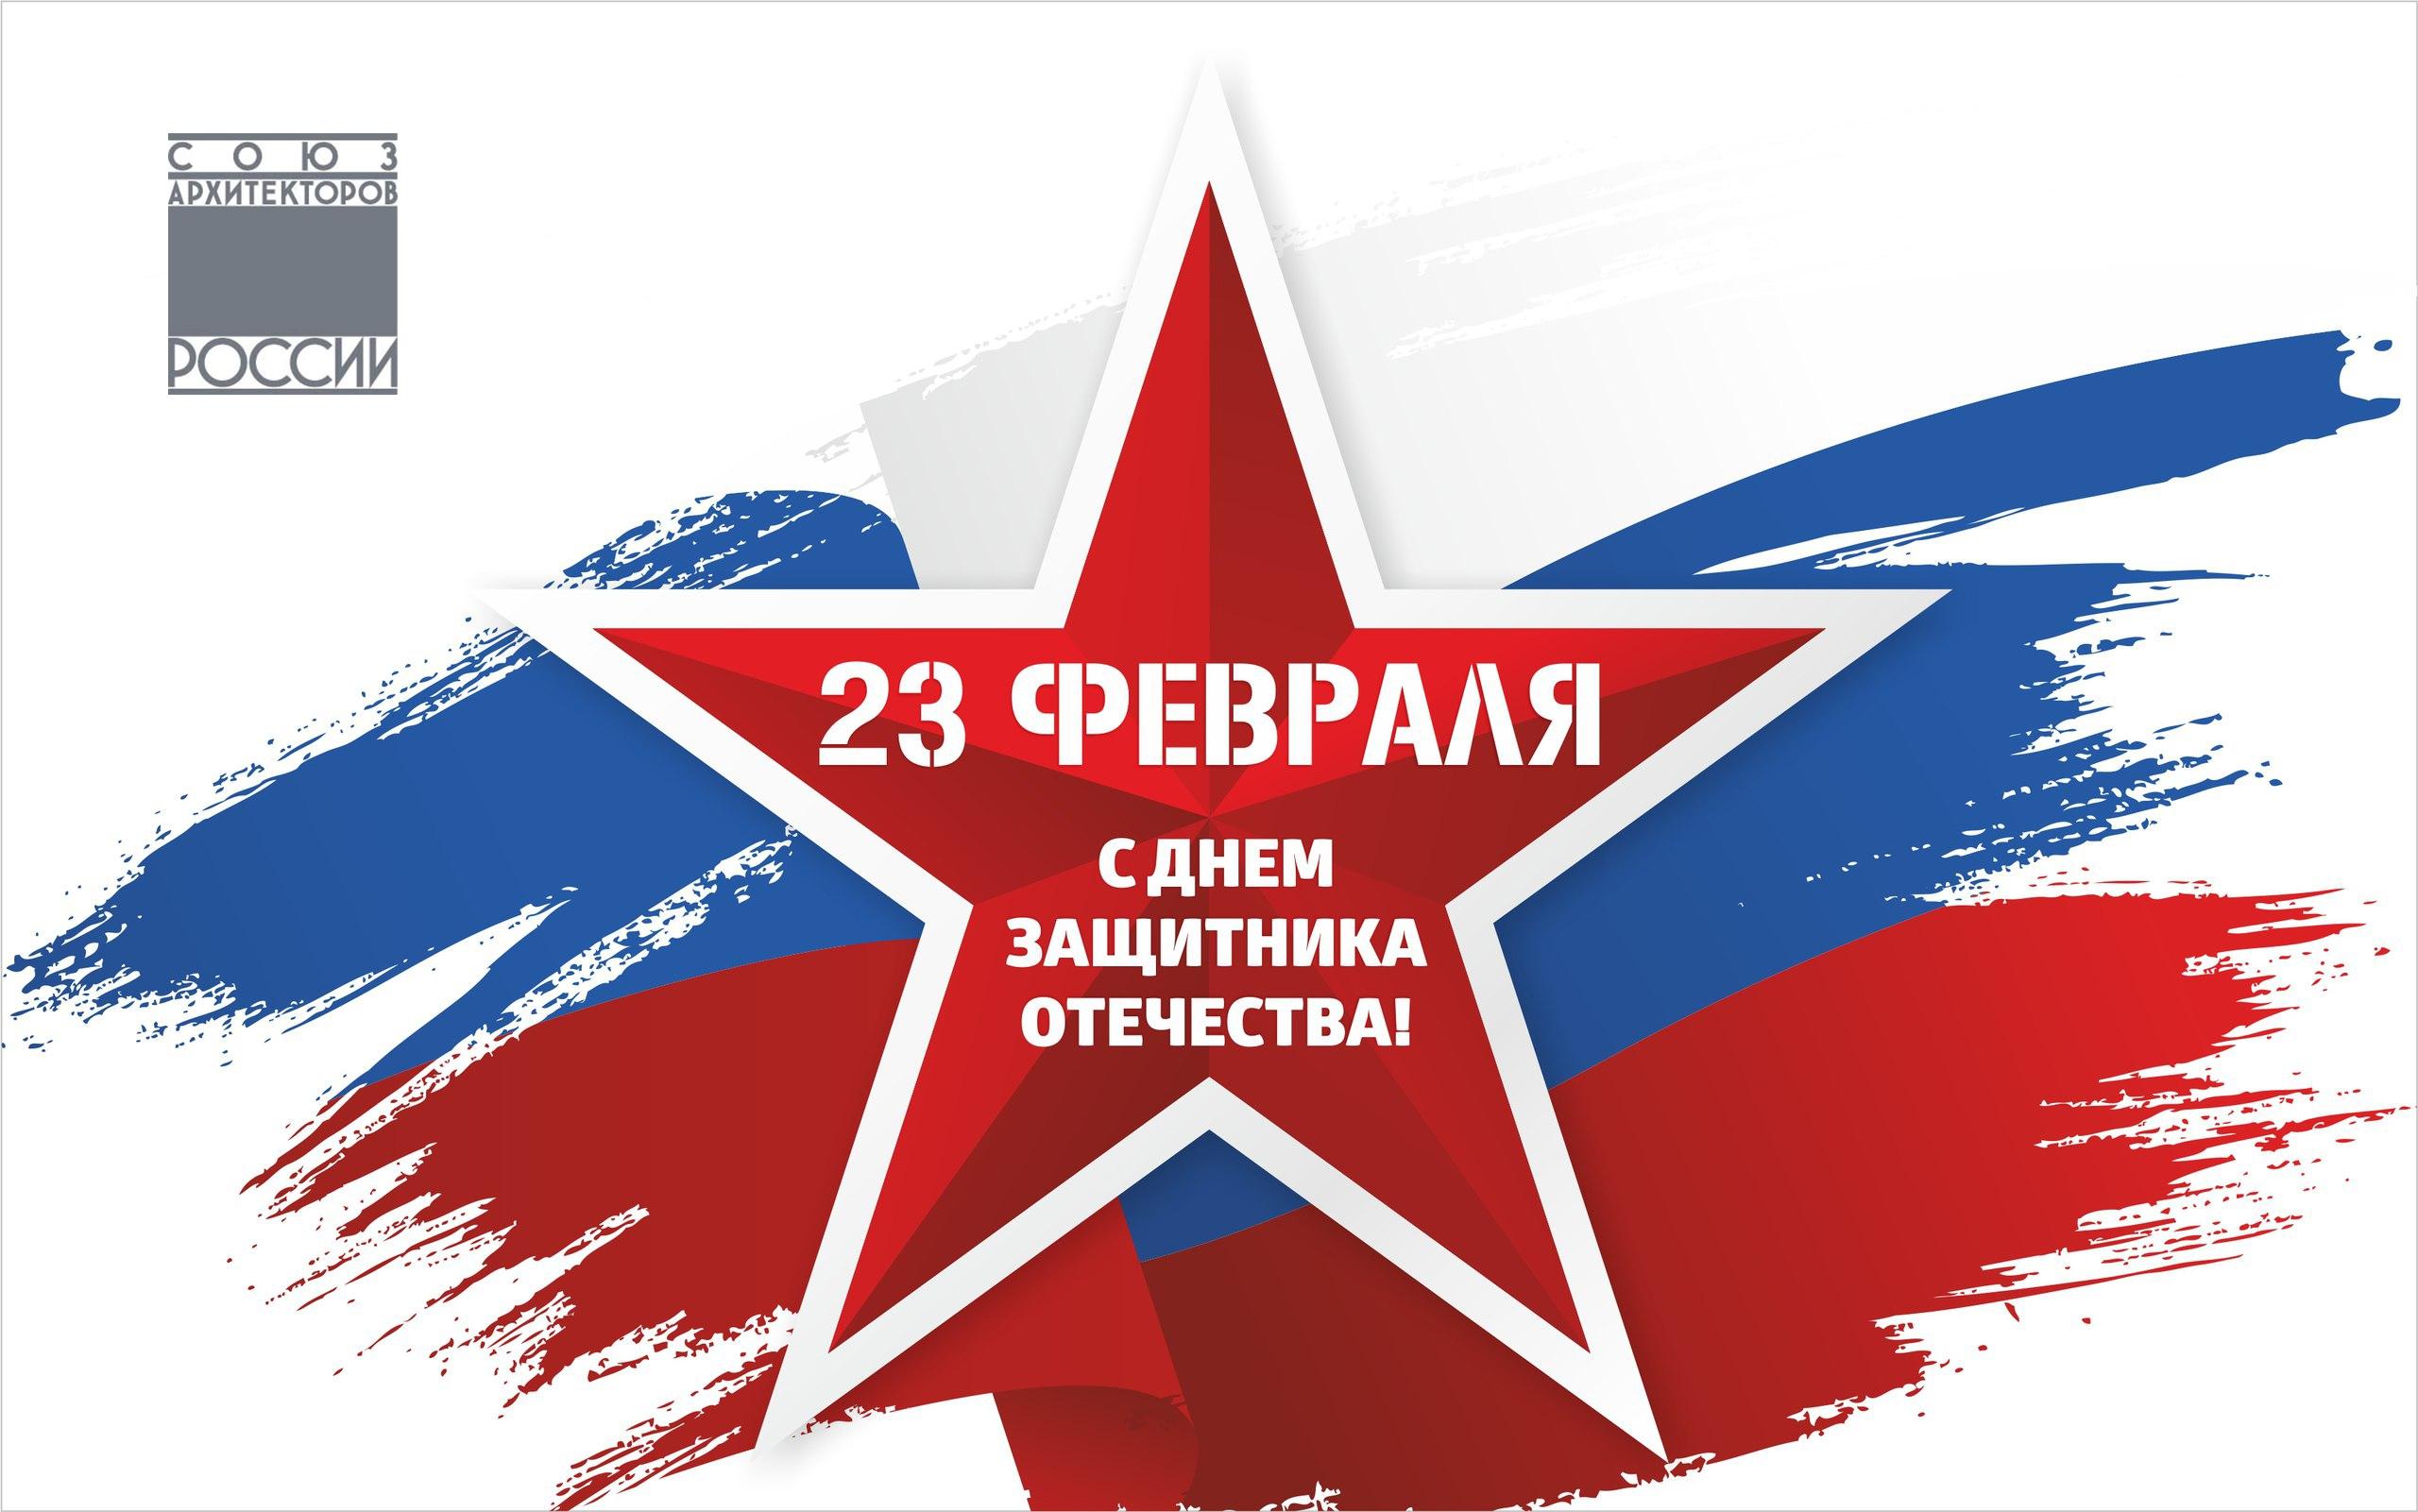 КРОСА России поздравляет мужчин с Днем защитника Отечества!